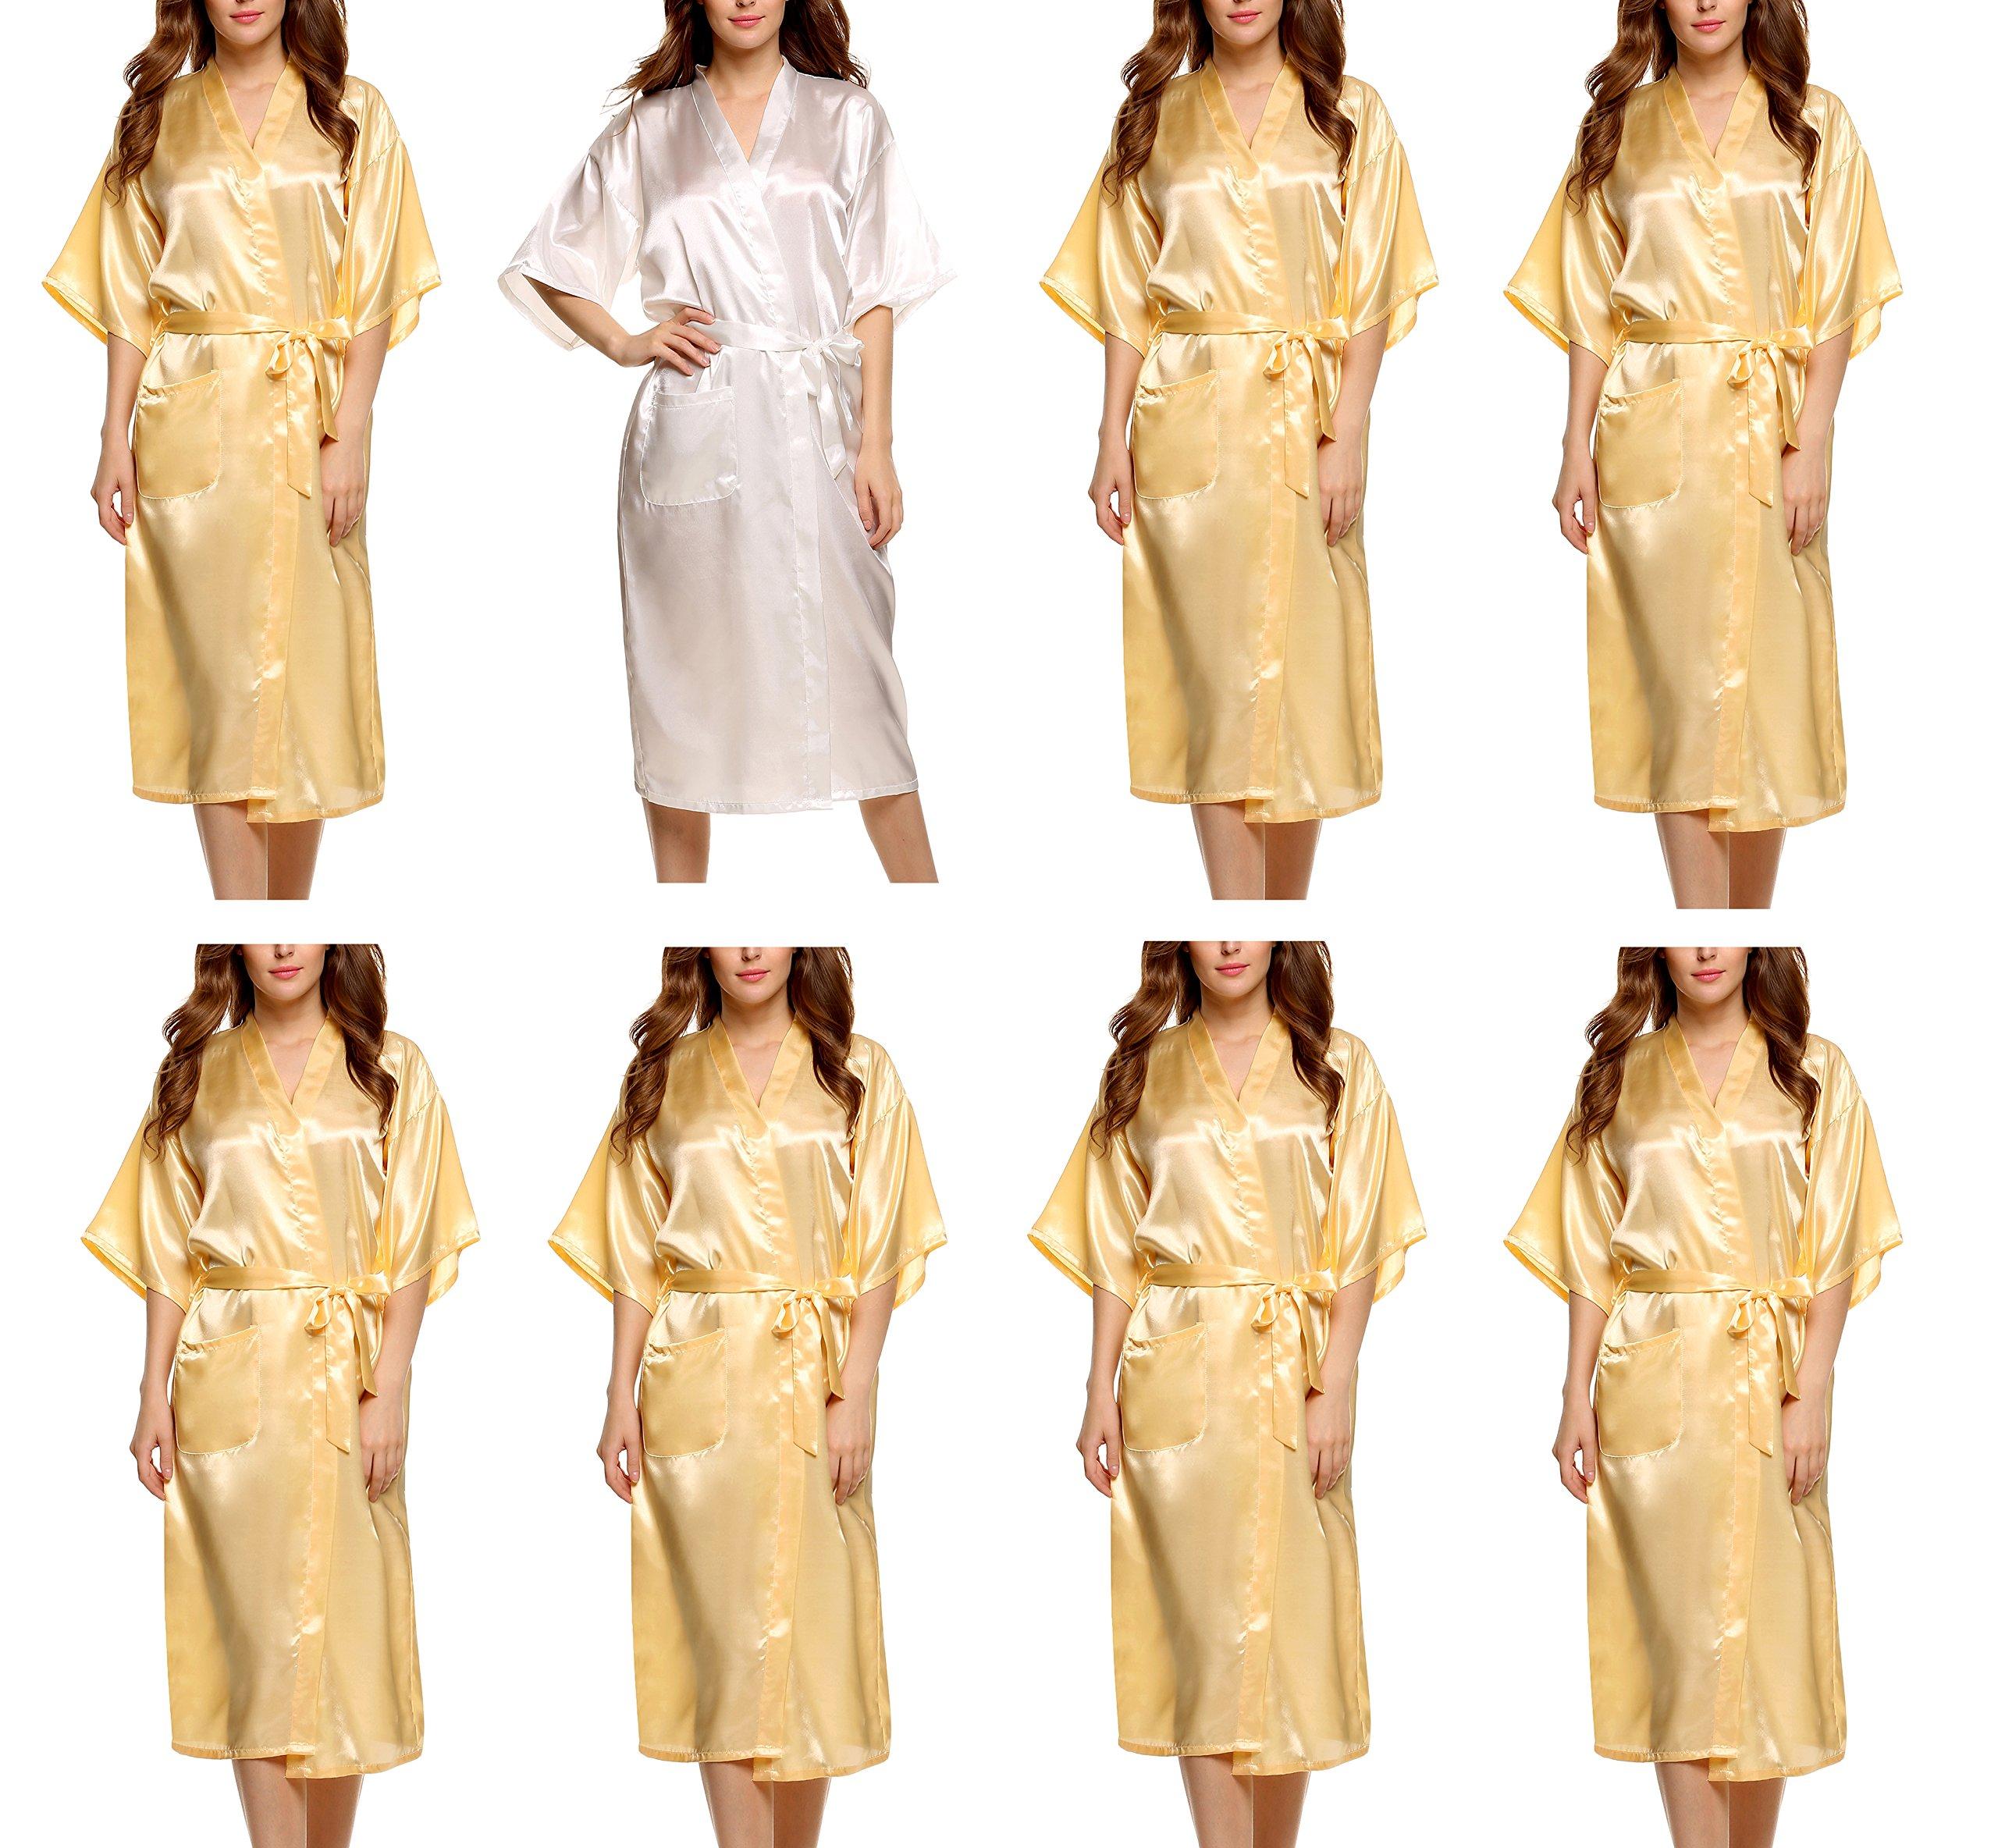 Avidlove Women's Bridesmaid Modern Peacock Kimono Robe Long Style 8 Packs by Avidlove